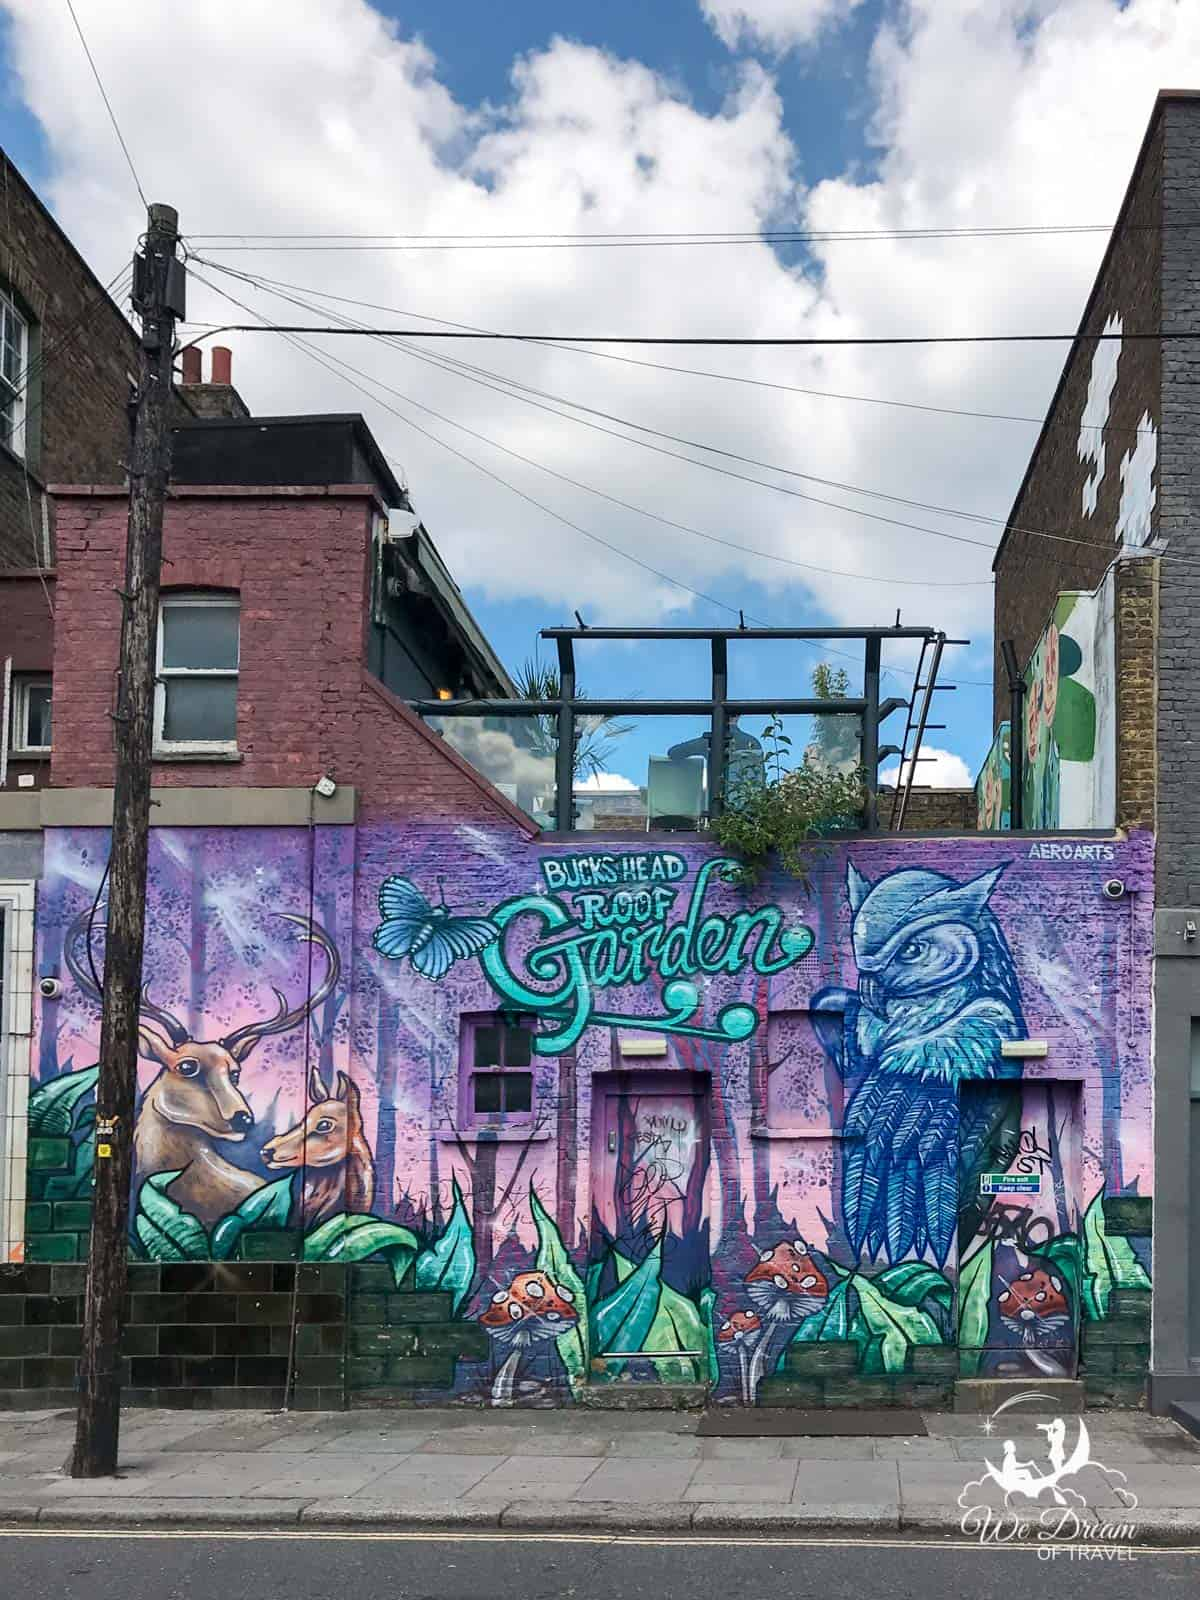 Bucks Head Roof Garden mural on the corner of Bucks Street and Camden High Street